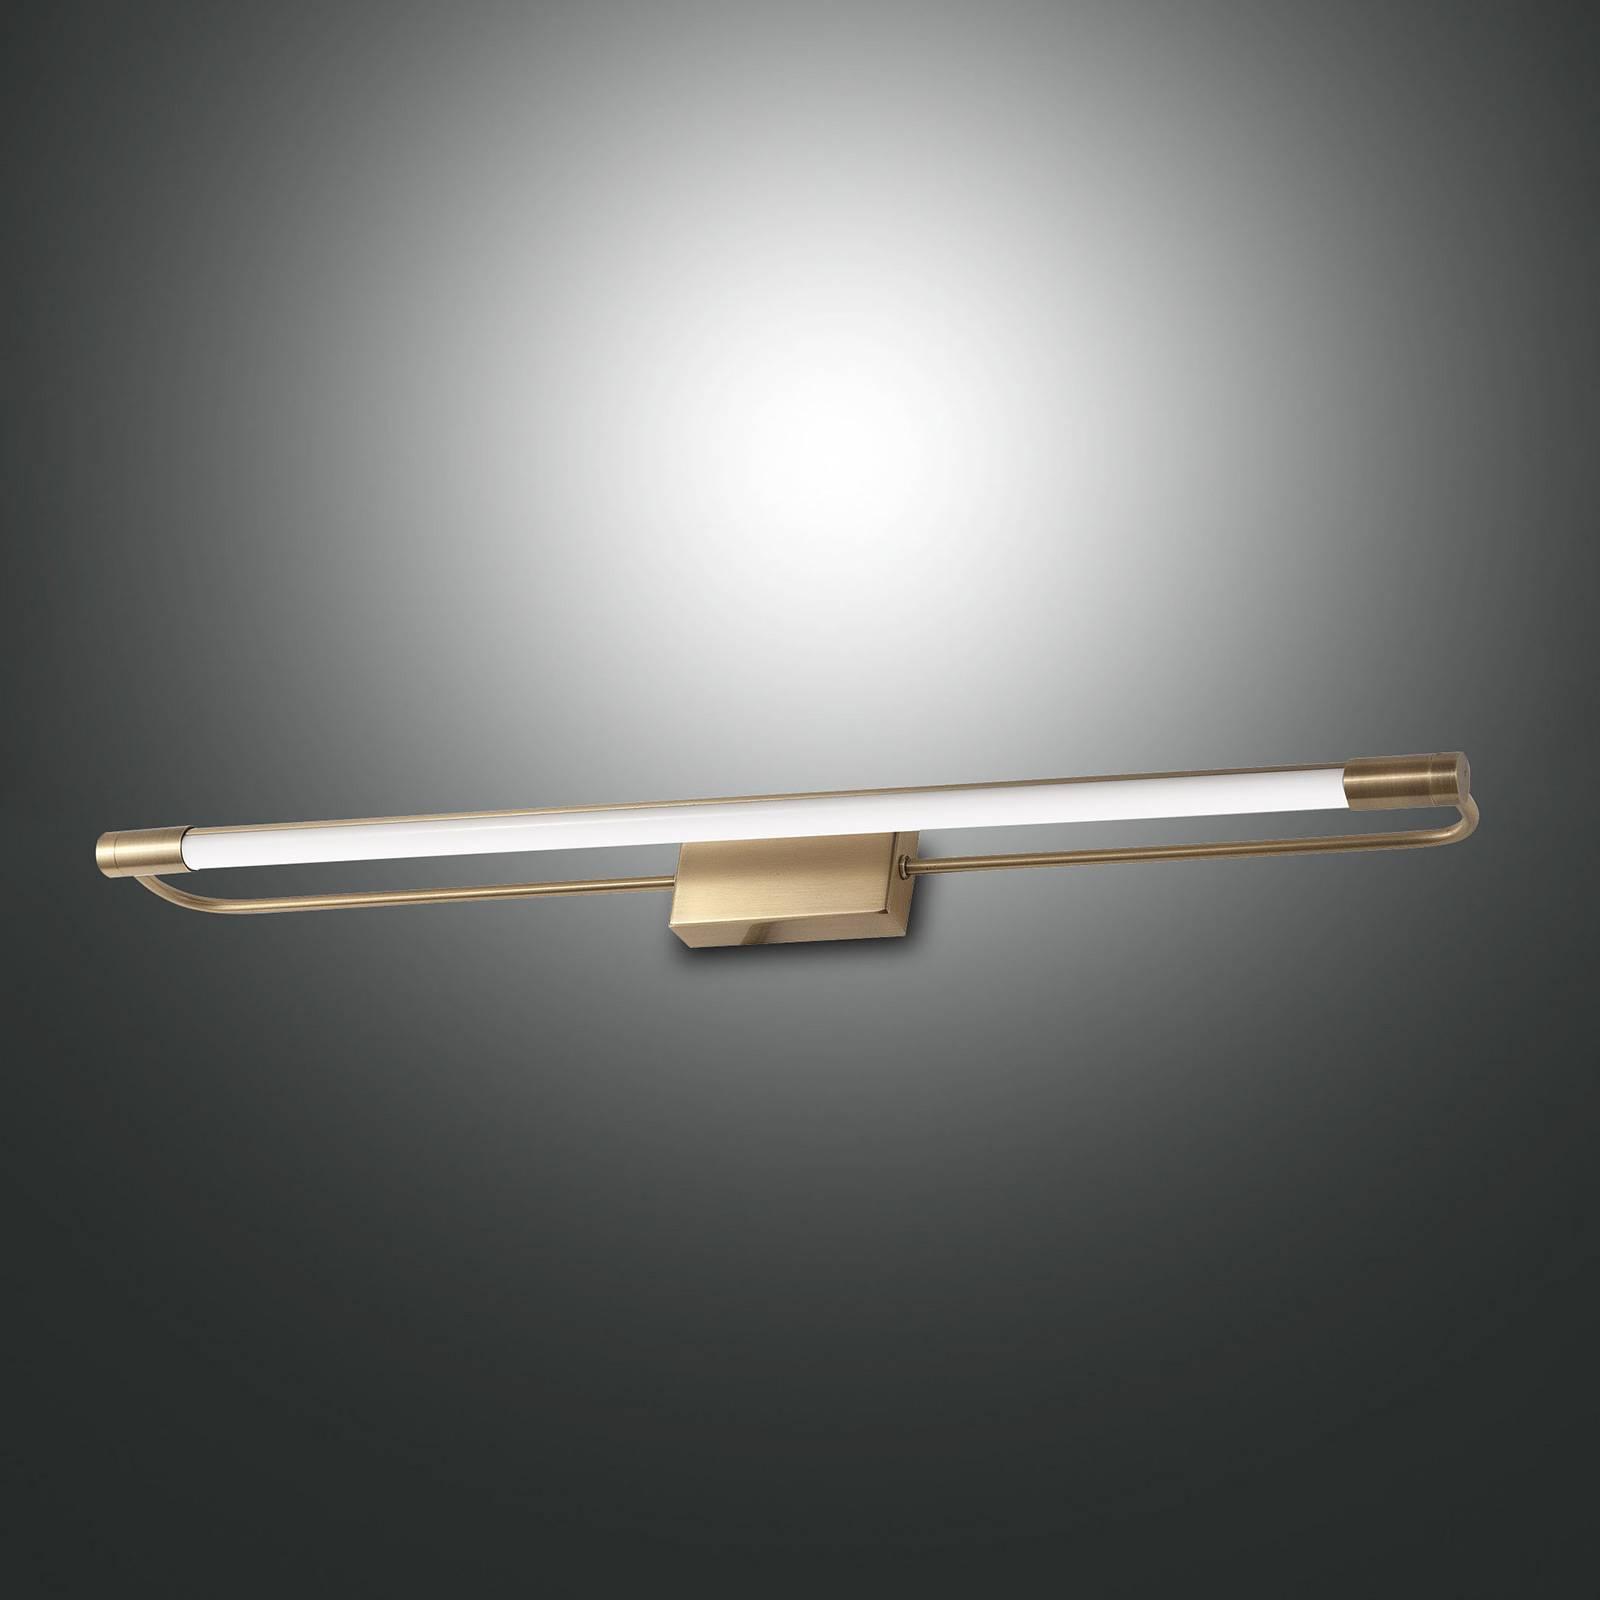 Applique LED Rapallo, laiton, IP44, 60cm